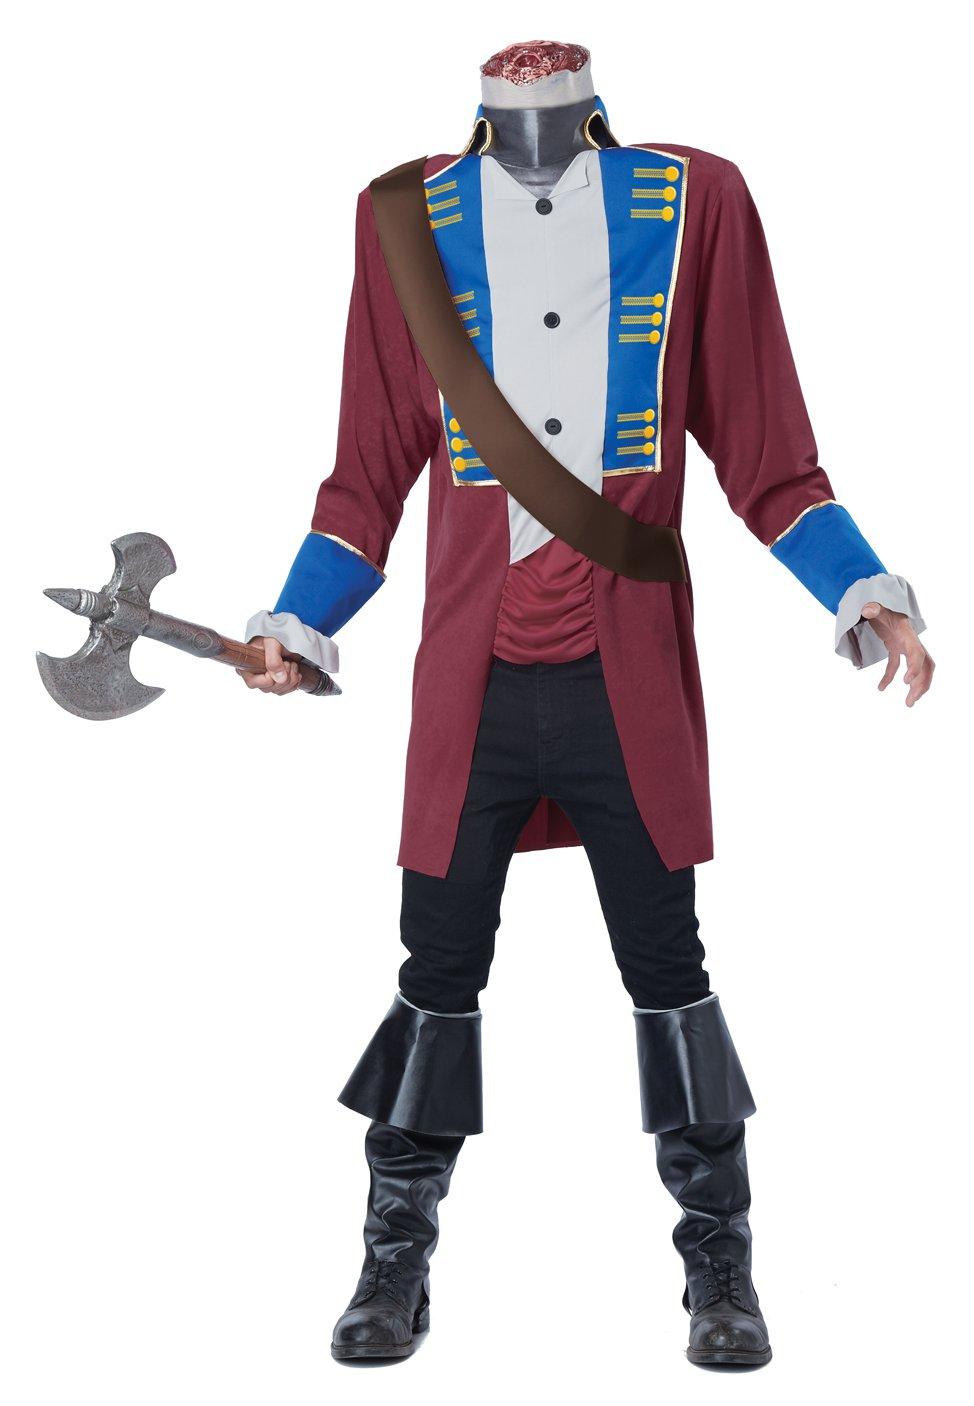 Sleepy Hollow Headless Horseman Adult Costume Size: Medium #01598